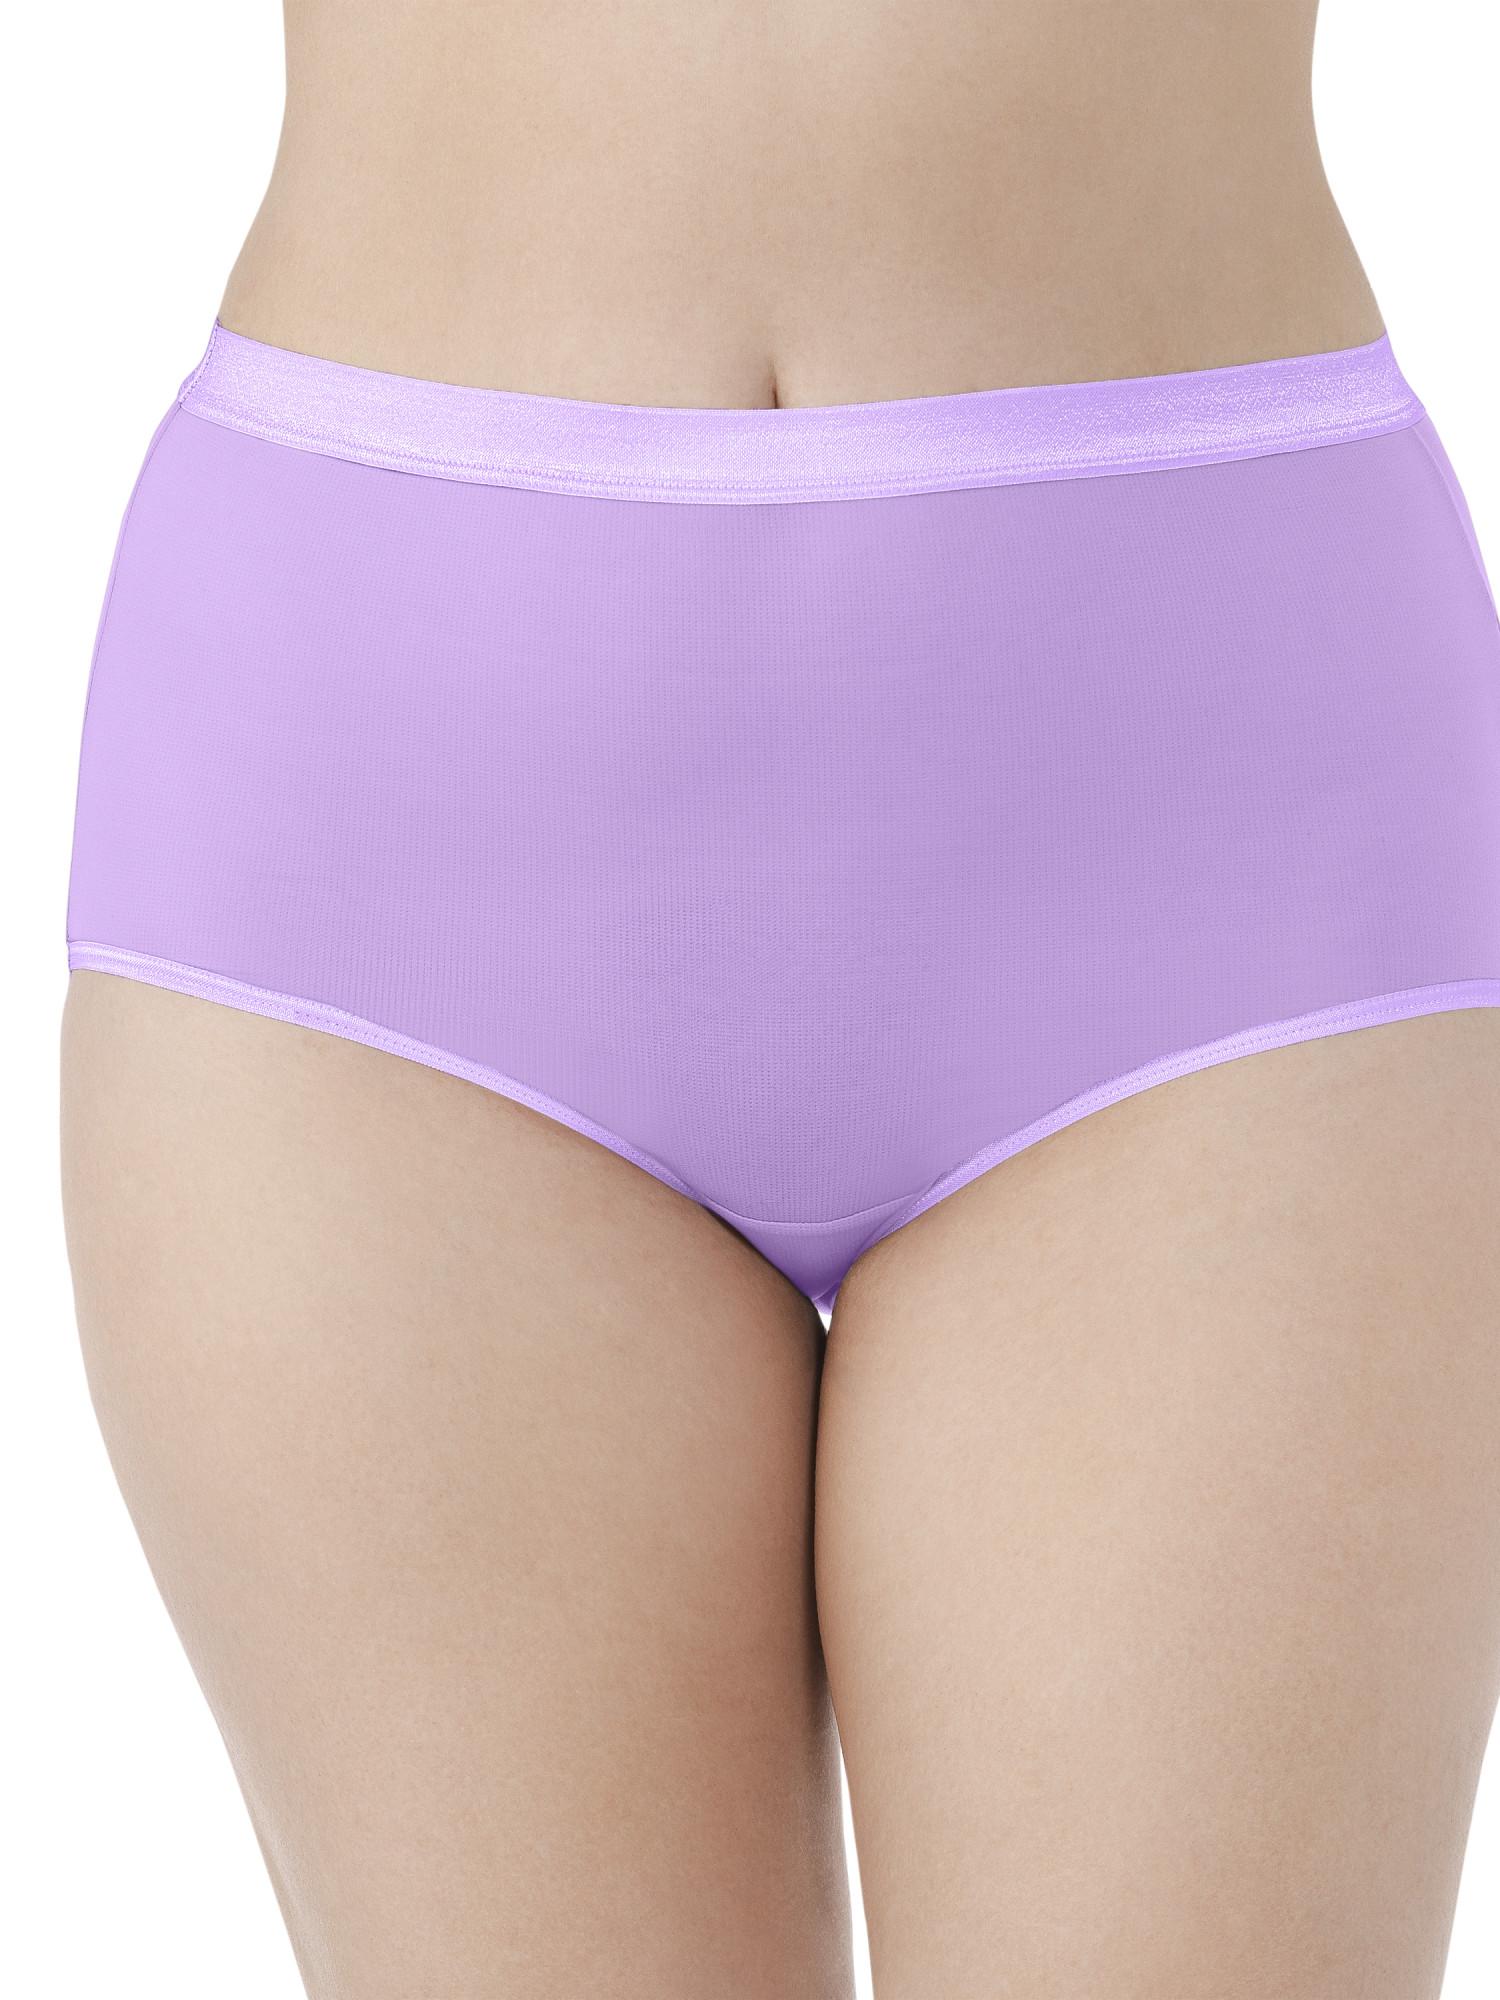 Women's Plus Everlight Brief Panties - 4 Pack